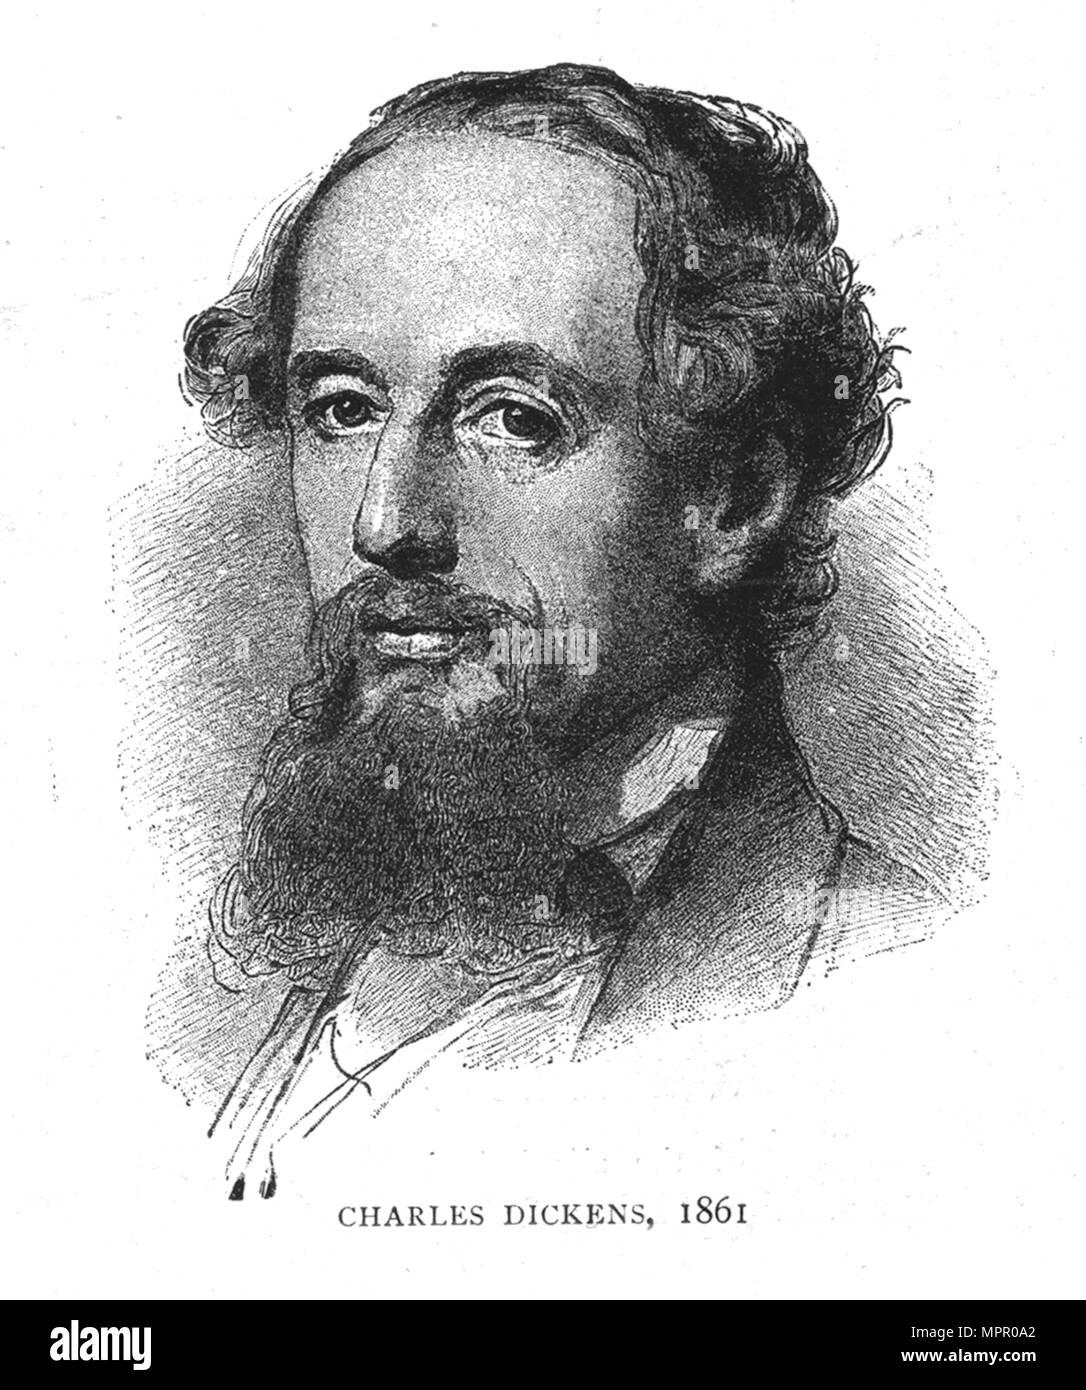 Charles Dickens, 1861. Artist: Wilhelm Auguste Rudolf Lehmann. - Stock Image